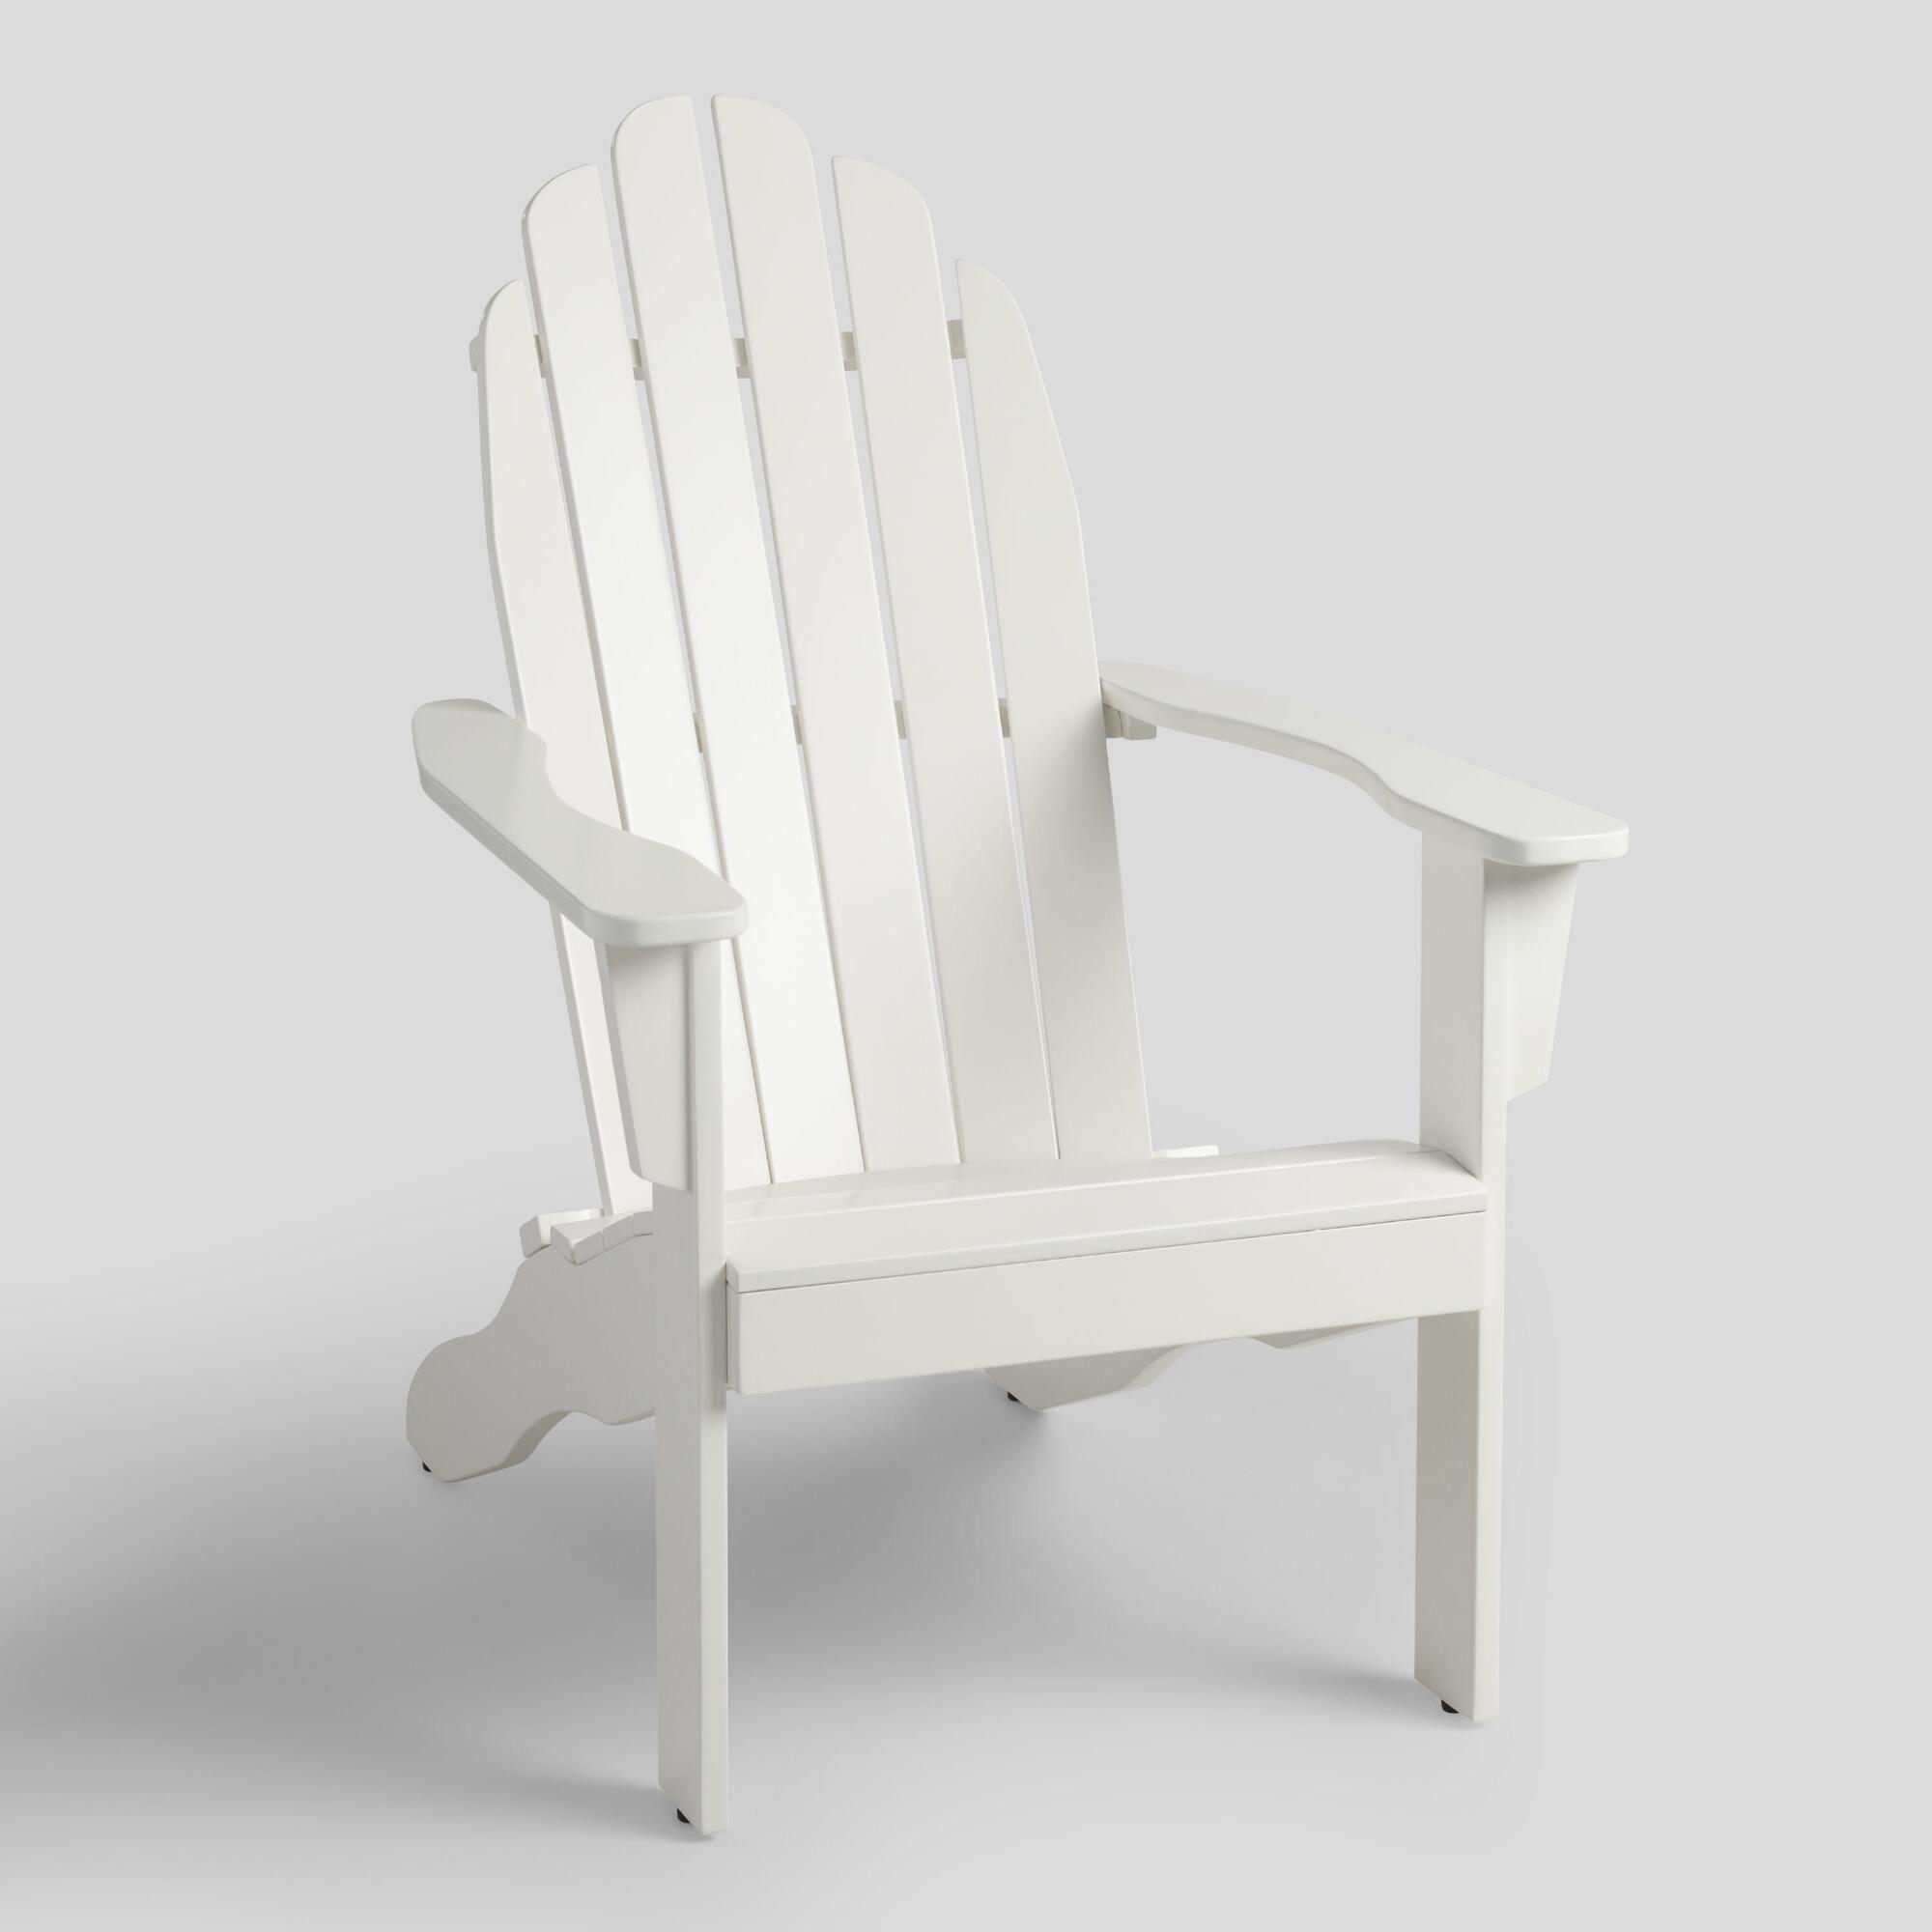 Antique White Adirondack Chair Wood By World Market White